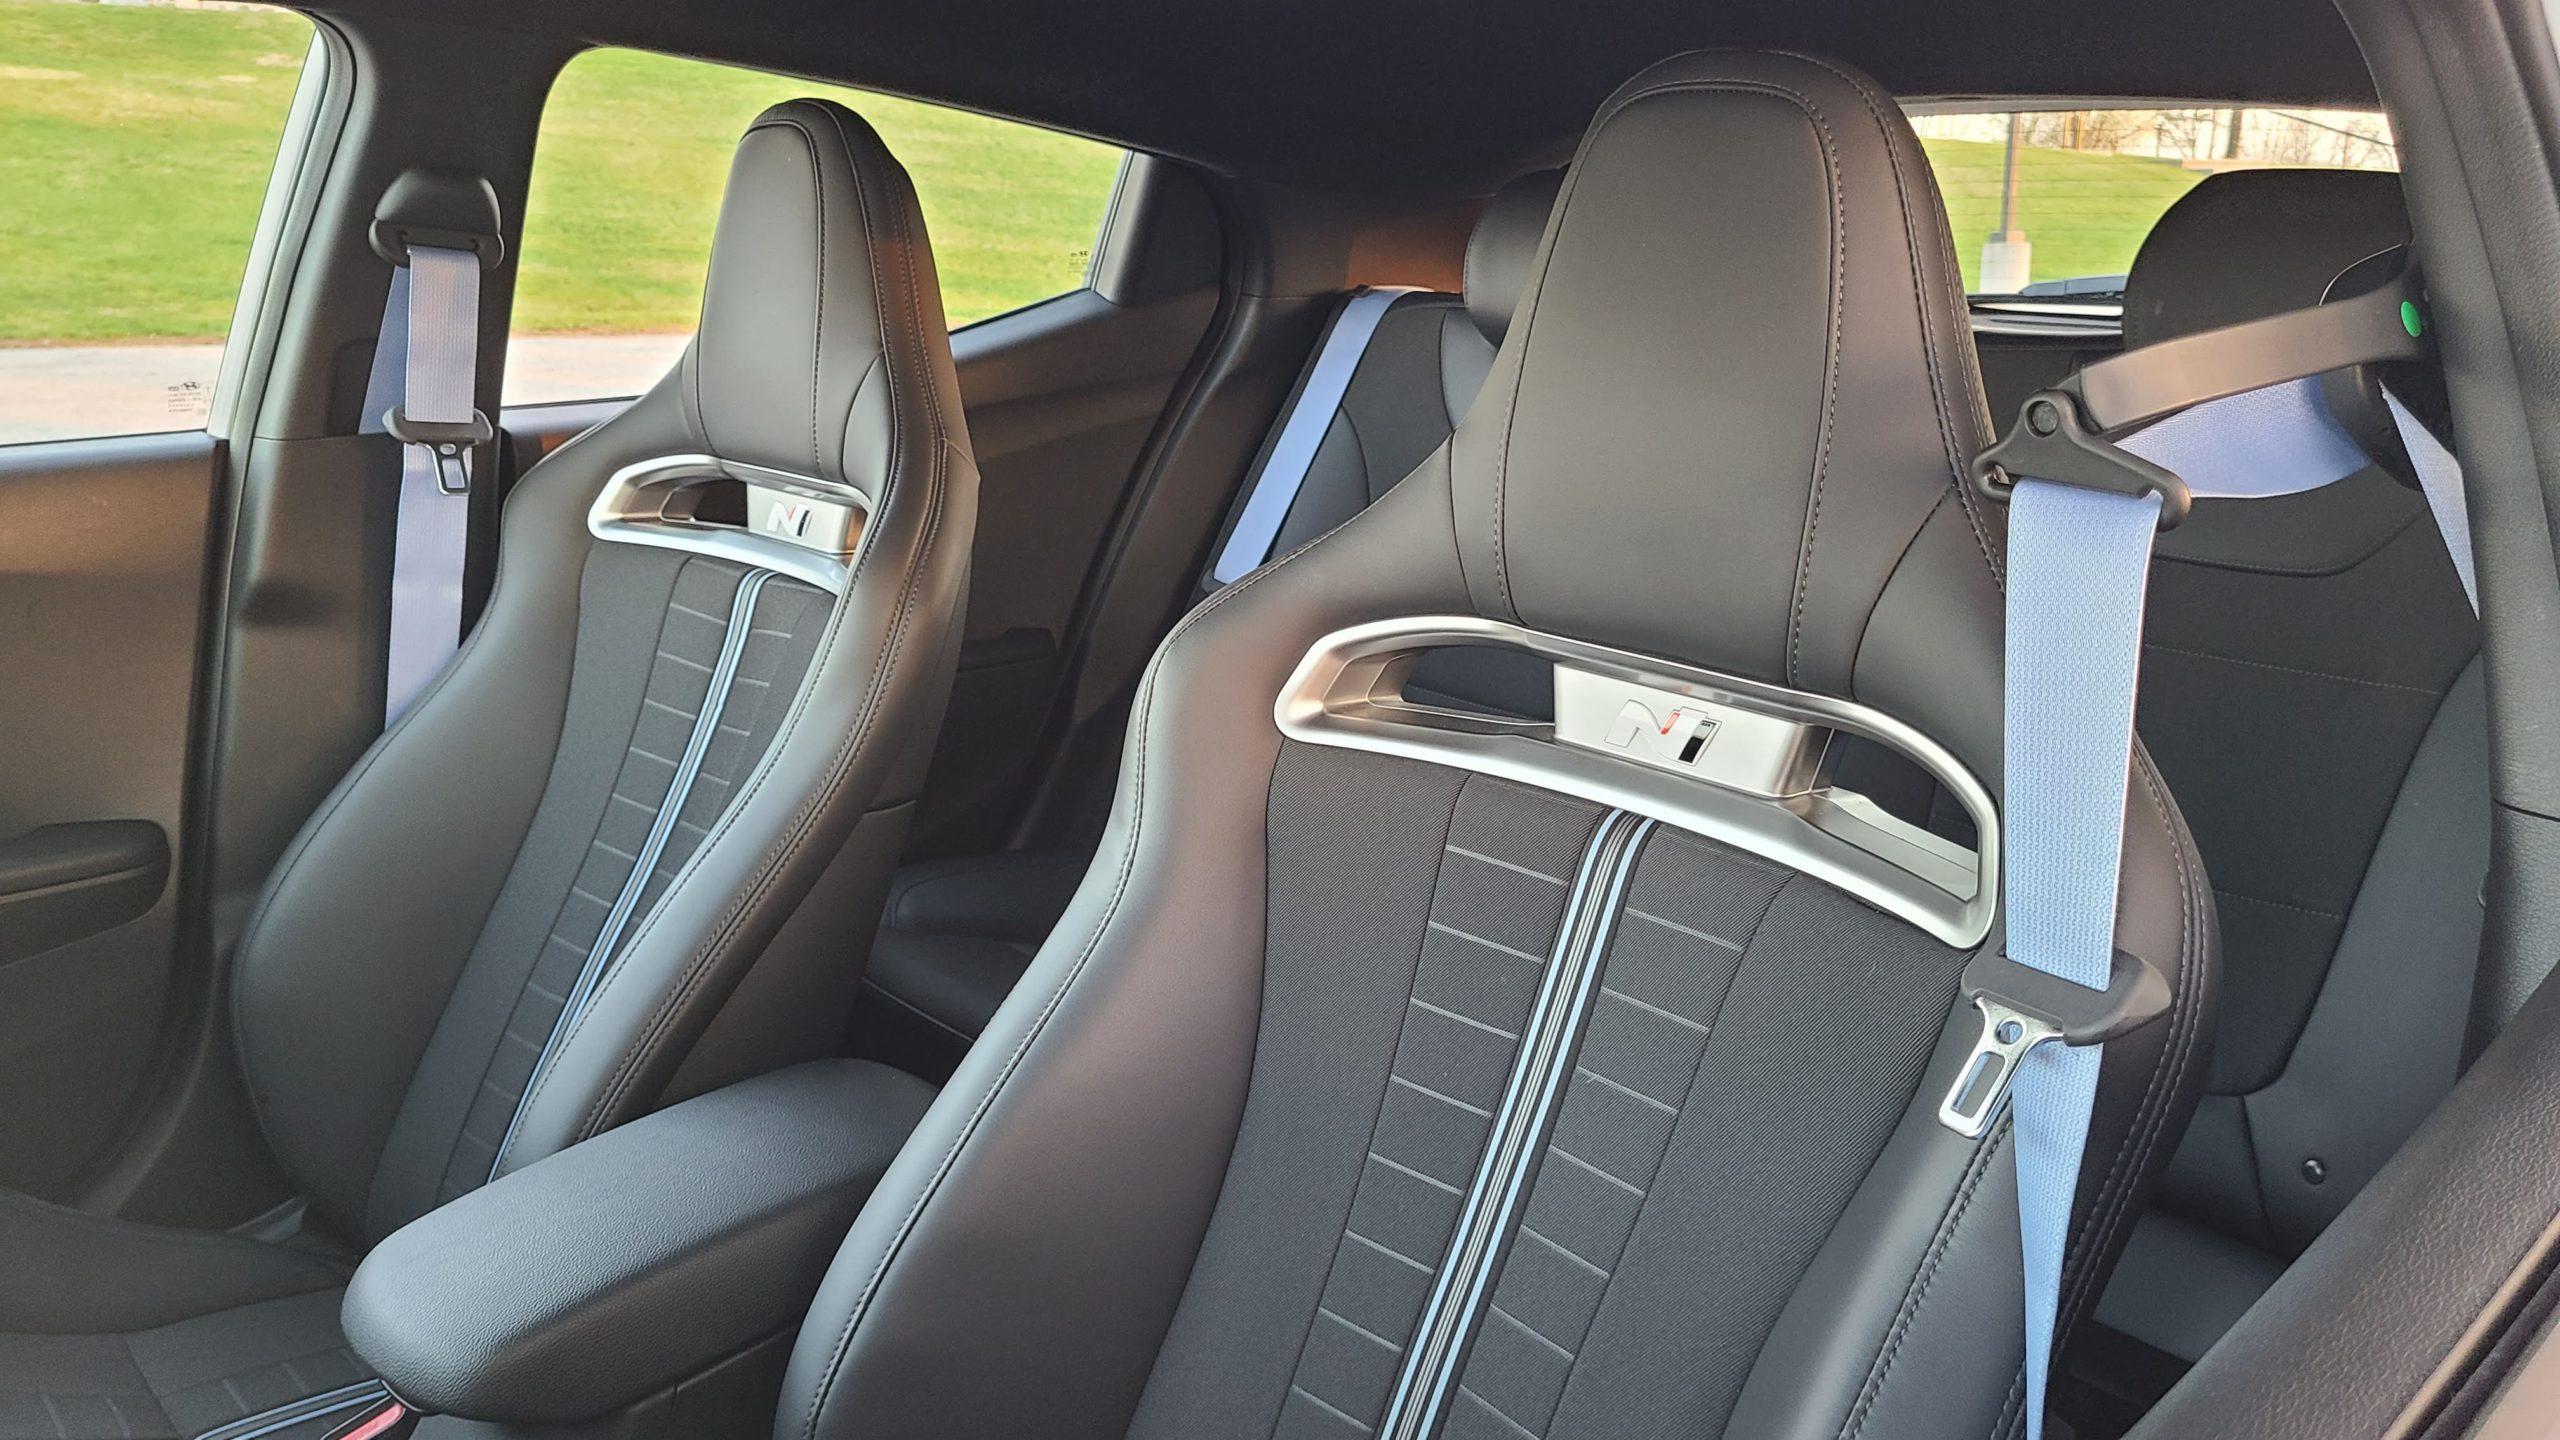 2021 Hyundai Veloster N seats